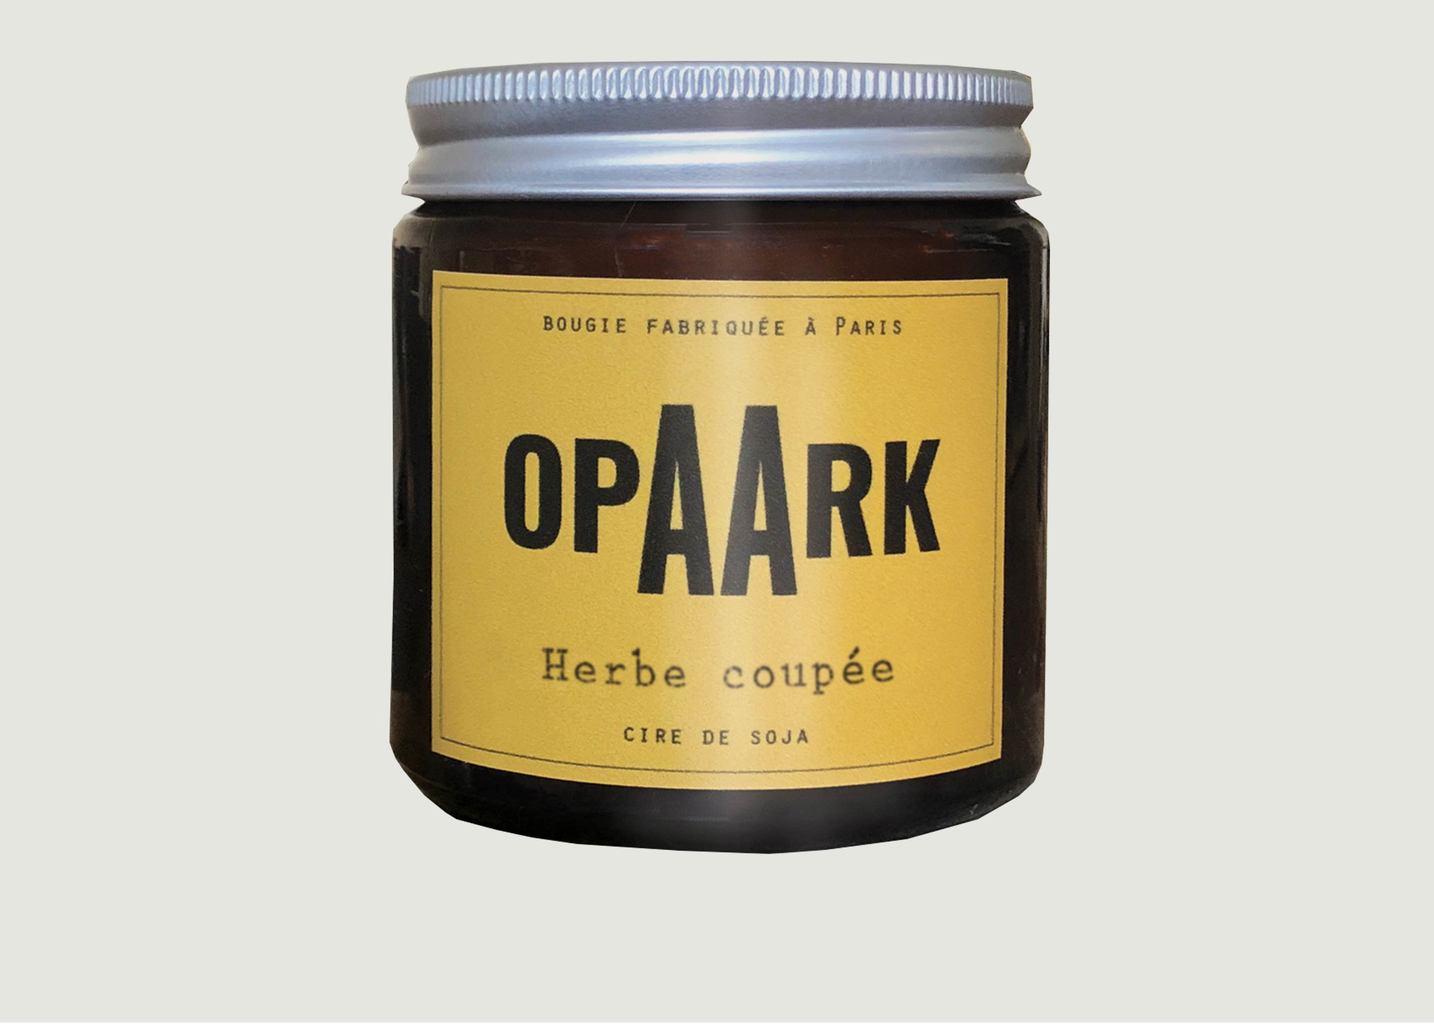 Bougie Herbe Coupée 90 gr - OPAARK